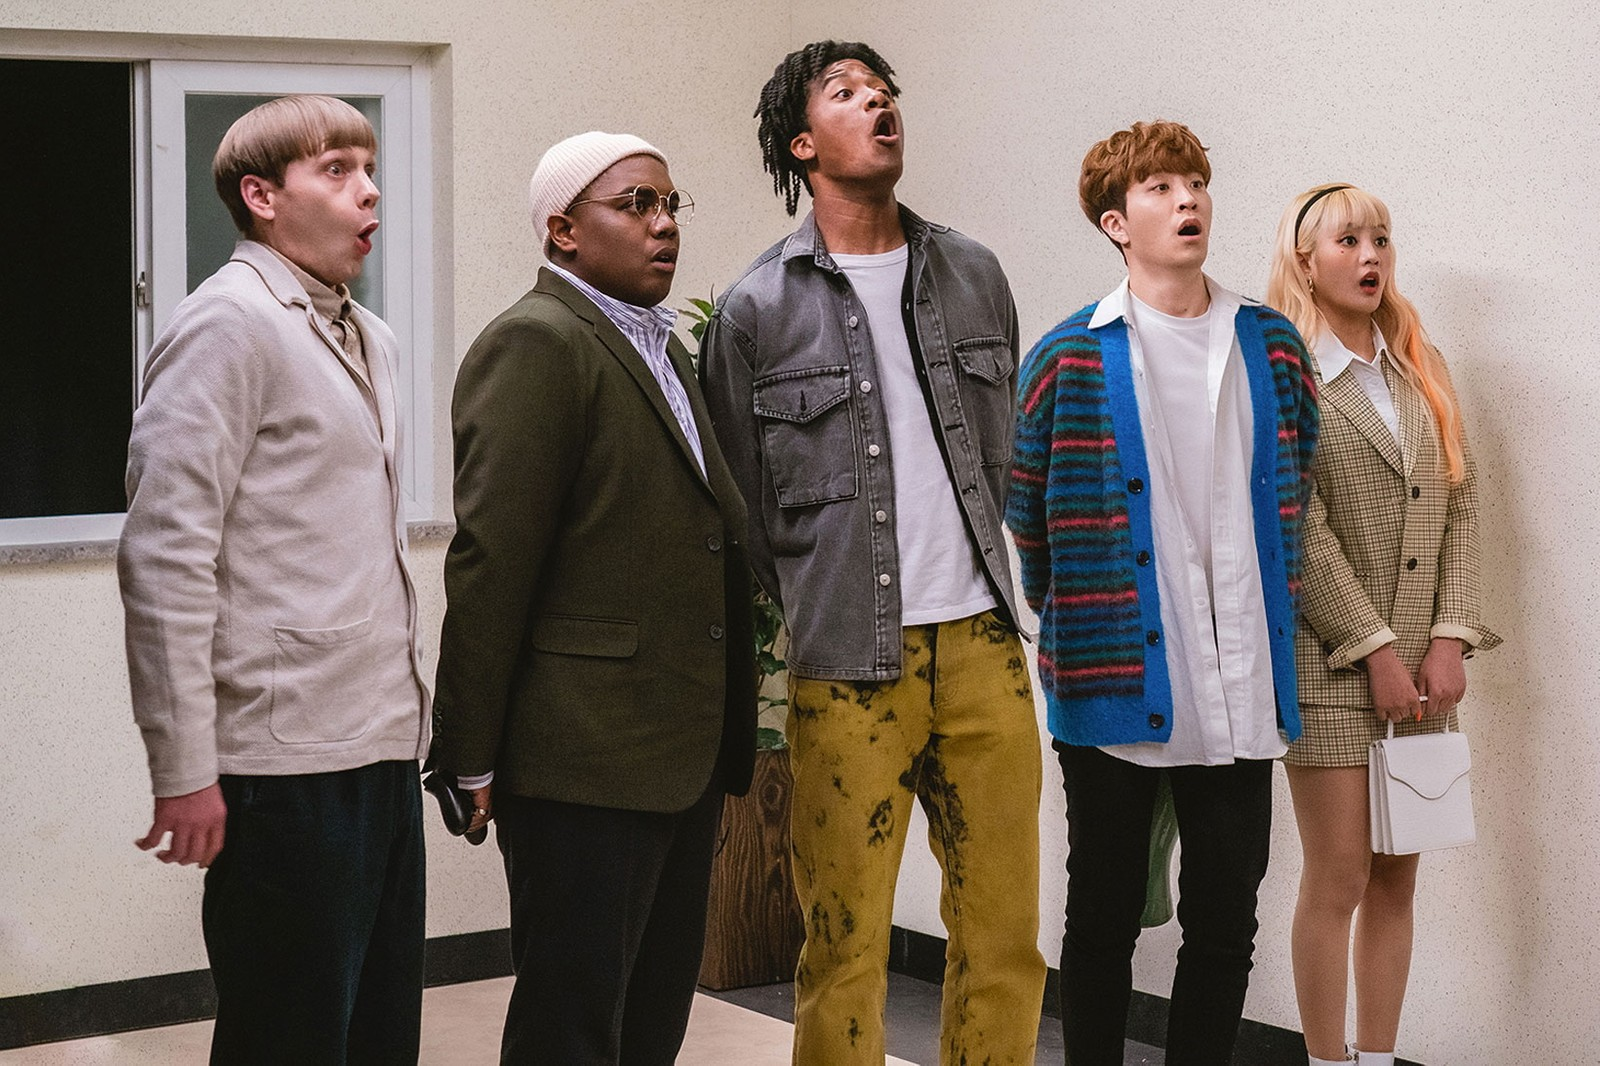 netflix originals korean kdramas tv shows sitcoms dp jung haein love alarm season 2 kingdom ashin of the north release info